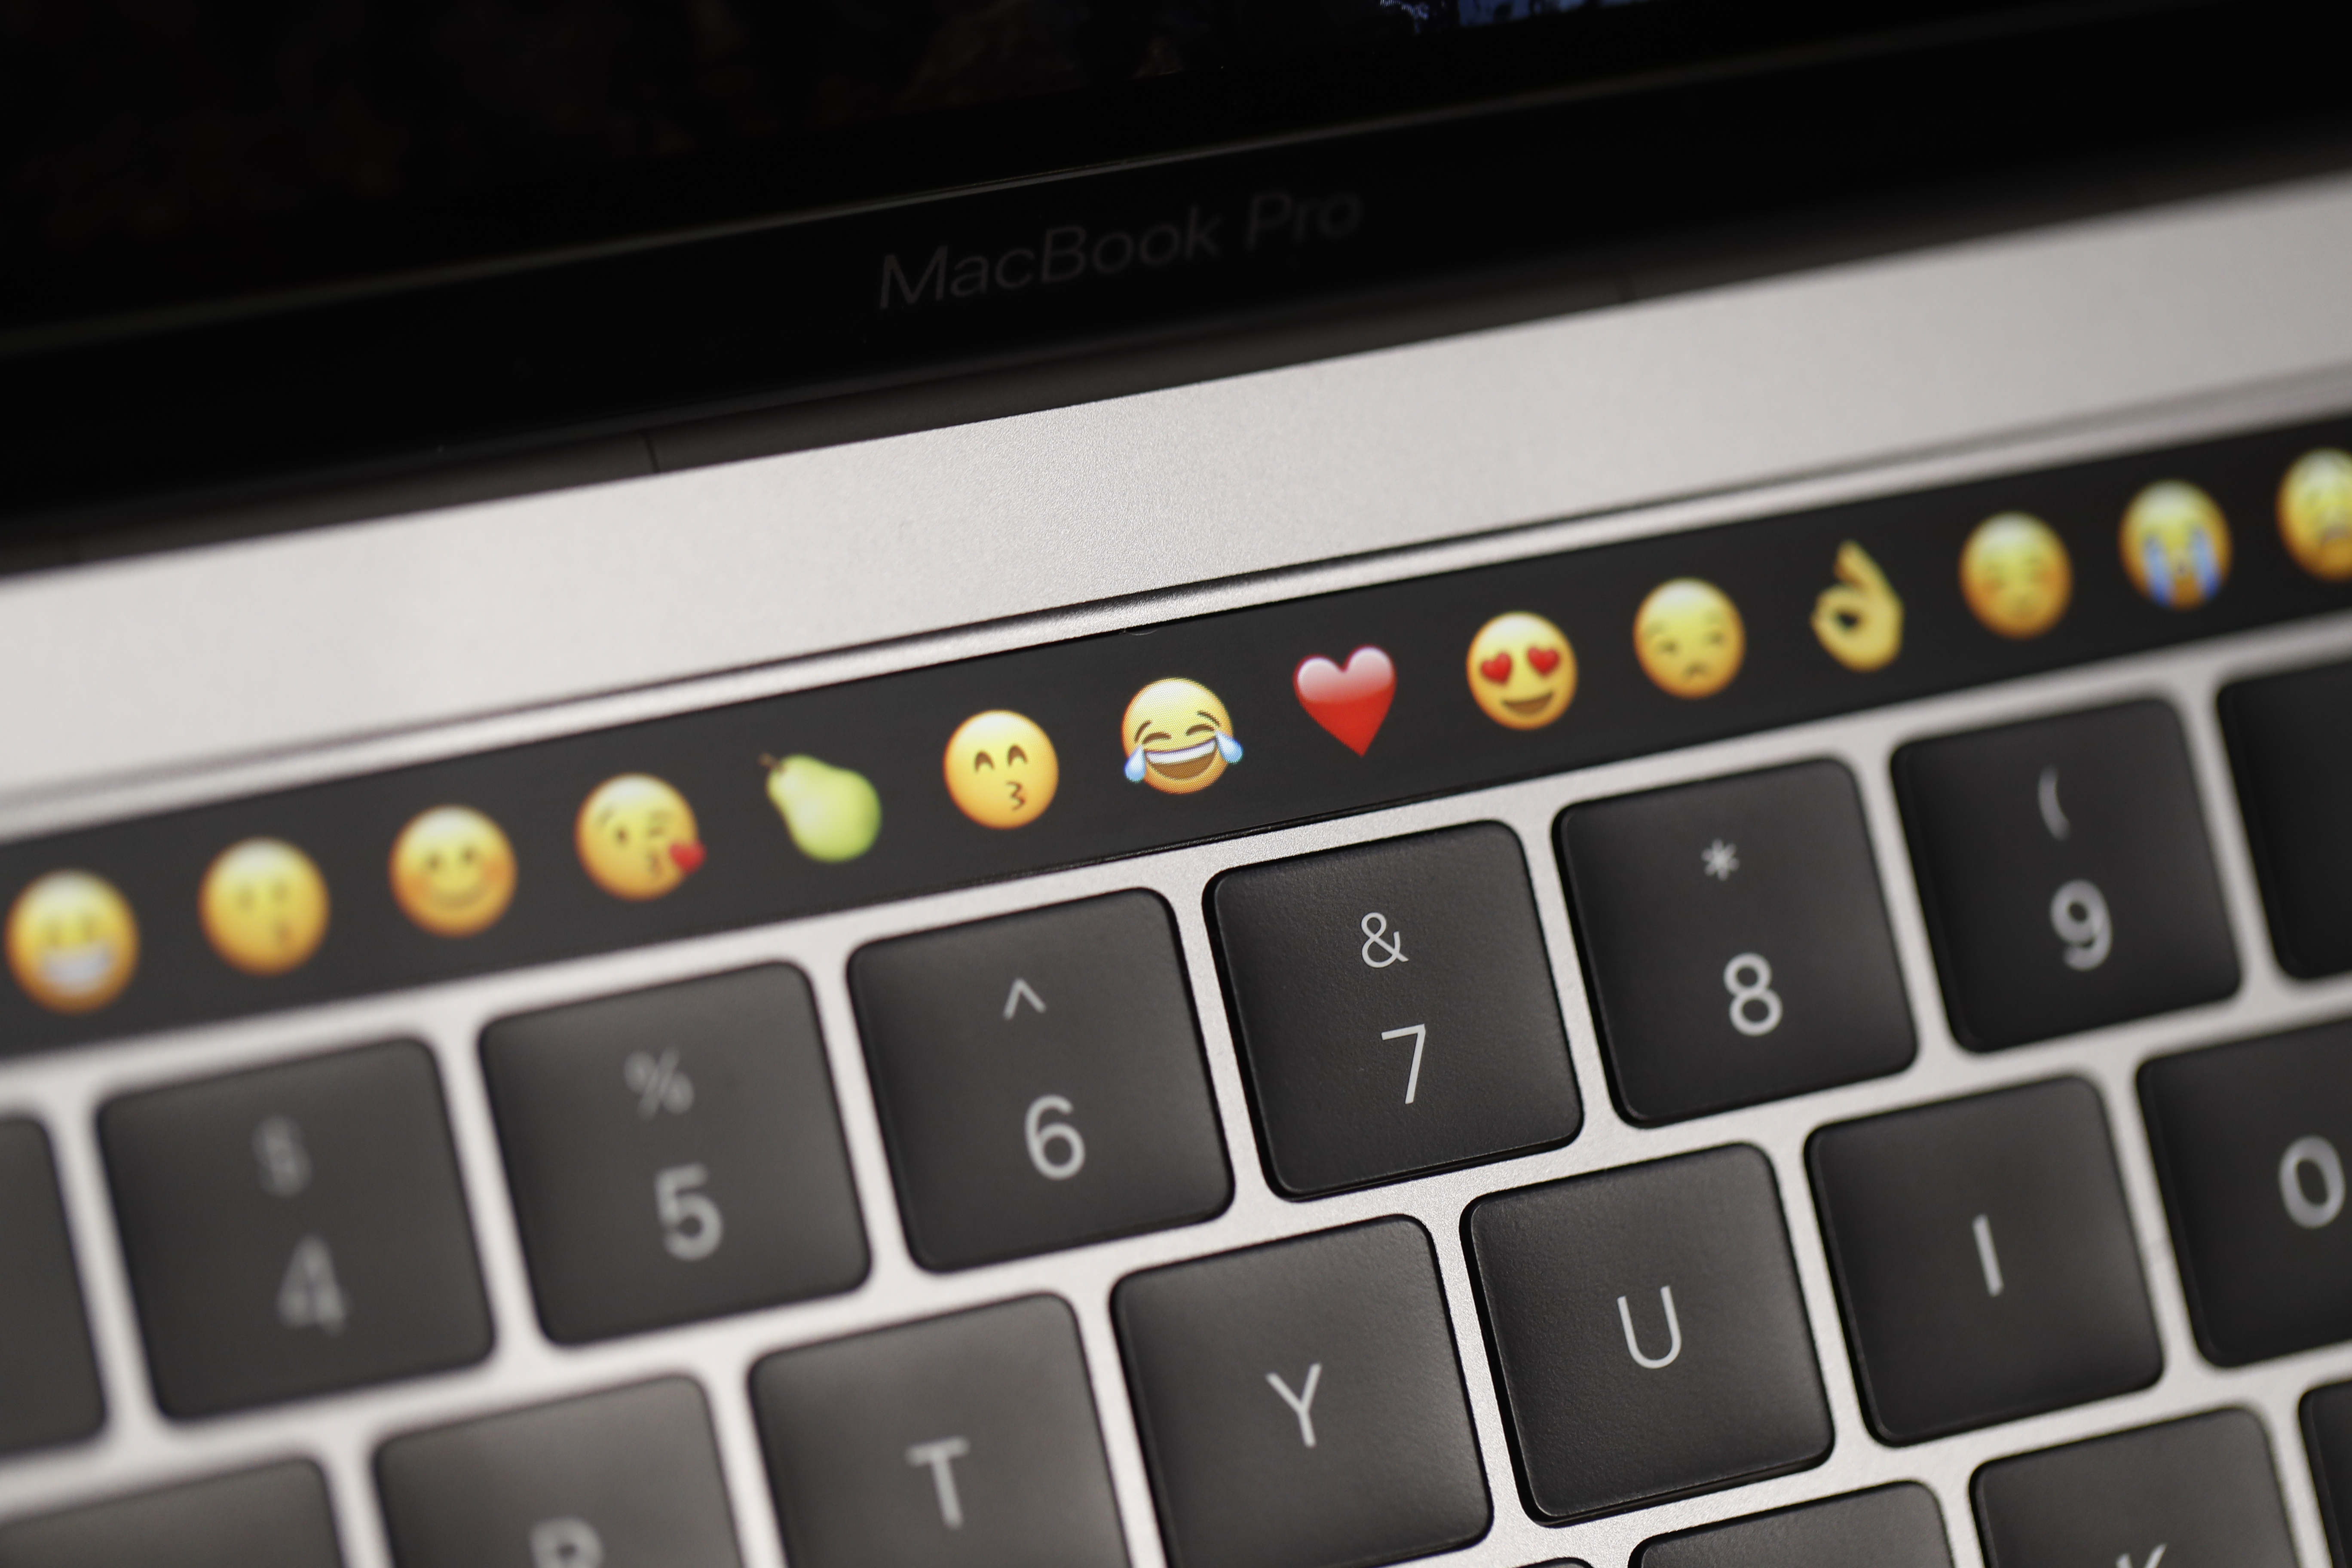 An Apple MacBook Pro's task bar displaying emojis above its keyboard.